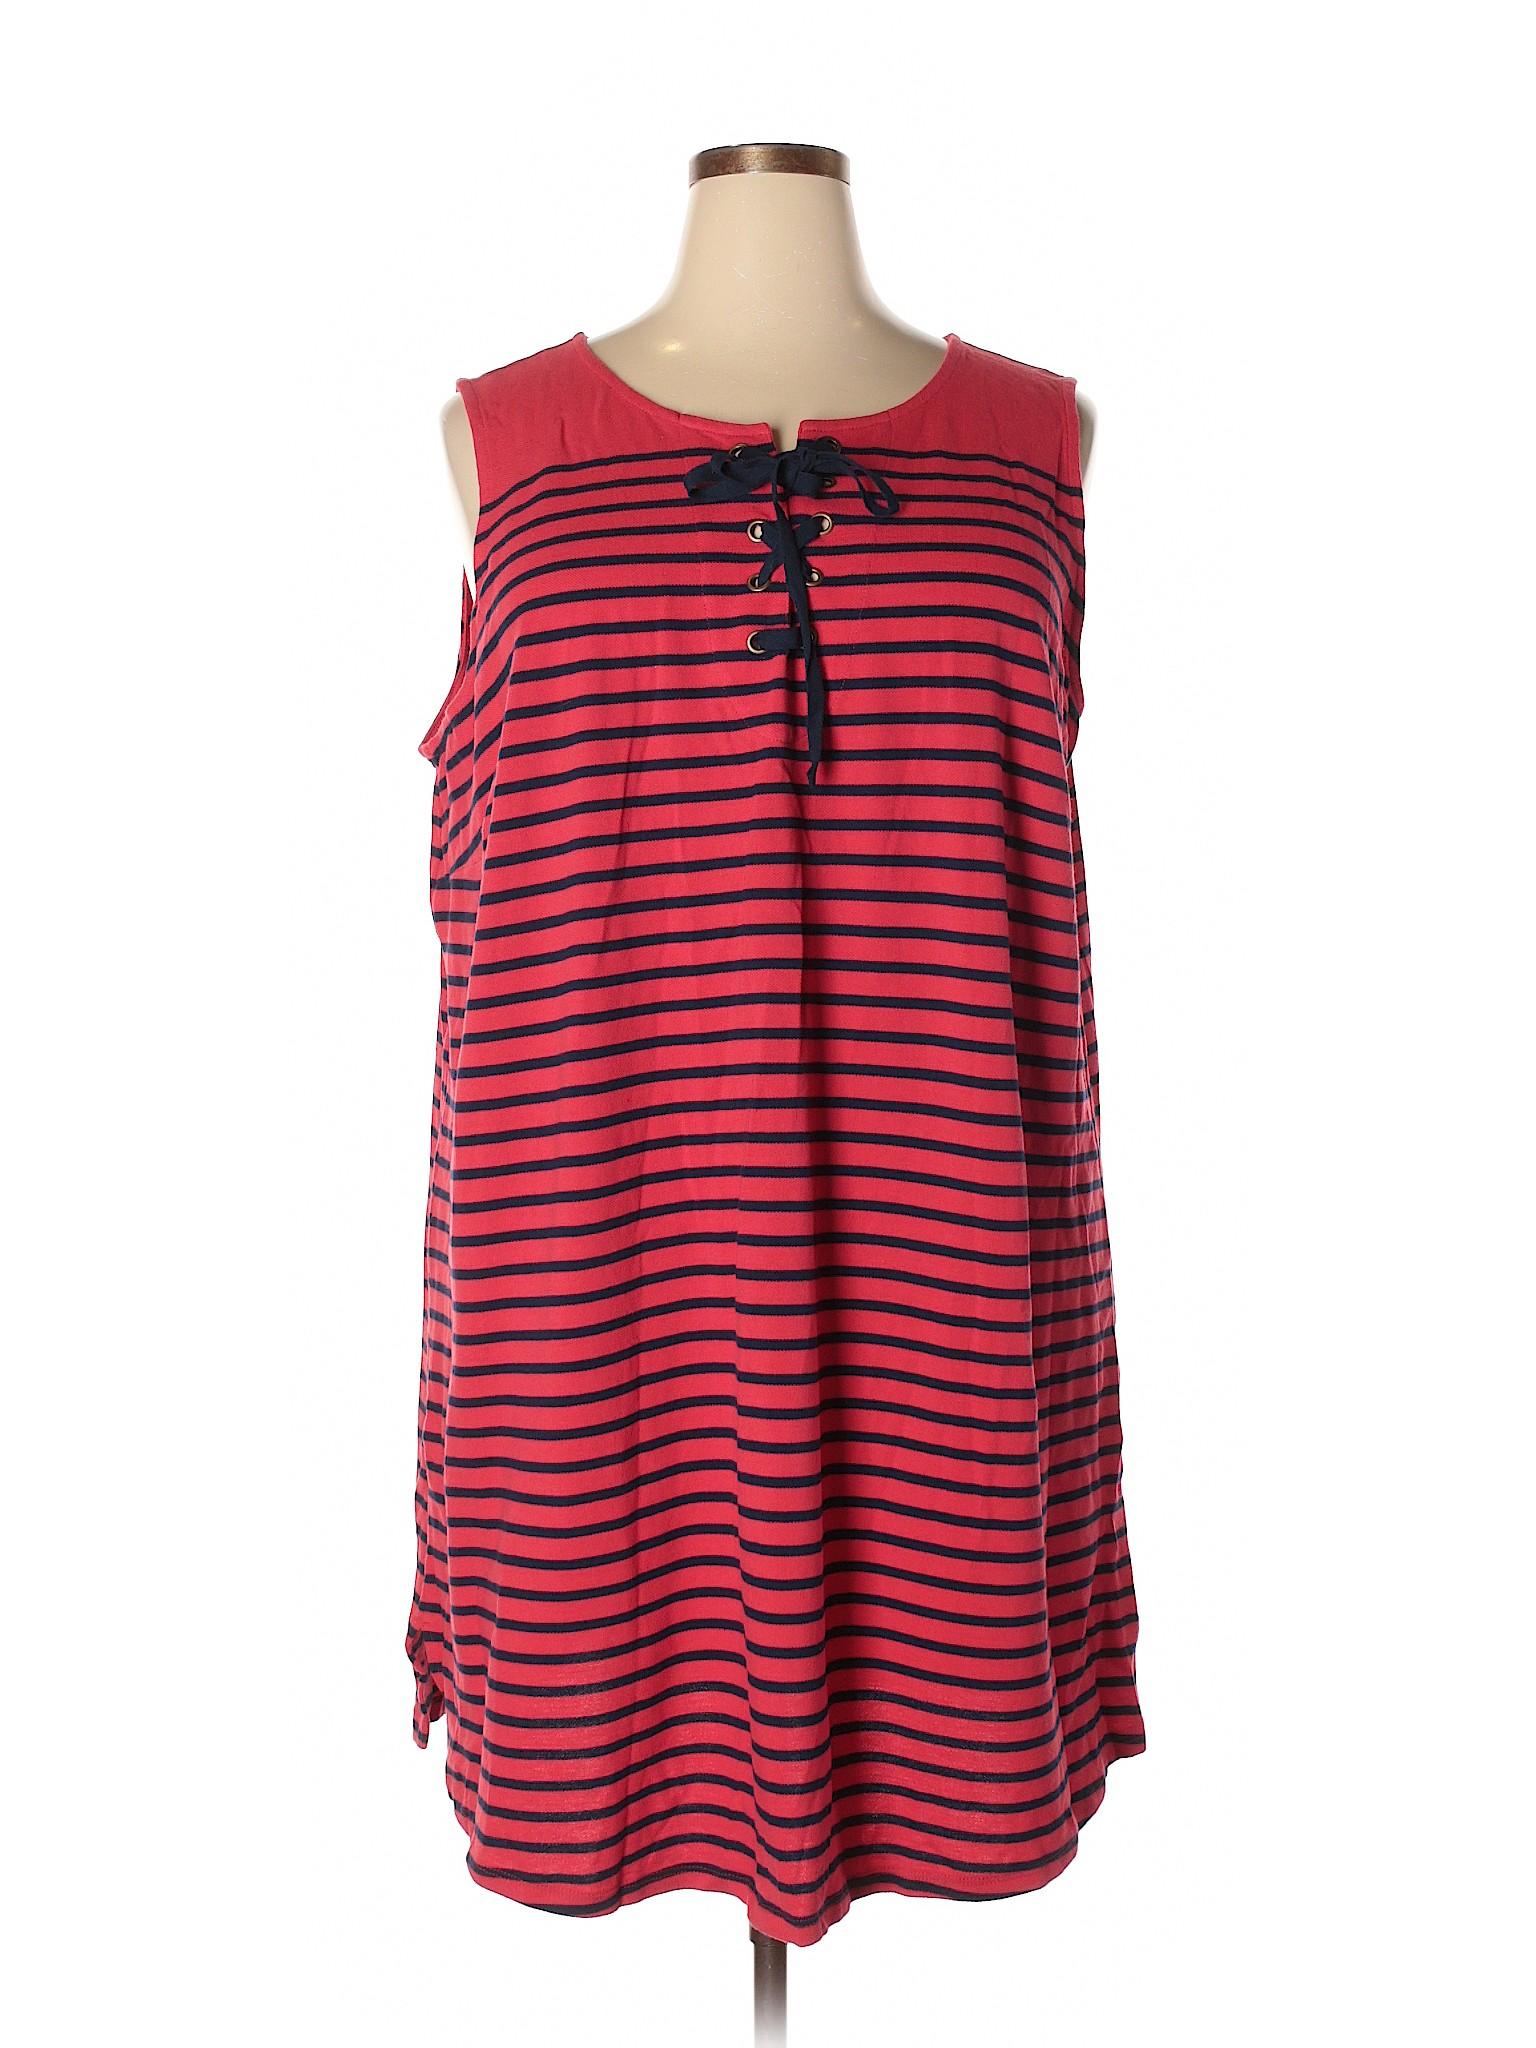 Boutique Dress Dress Talbots winter Casual Boutique Casual Talbots winter Boutique wRxzqTfHrw